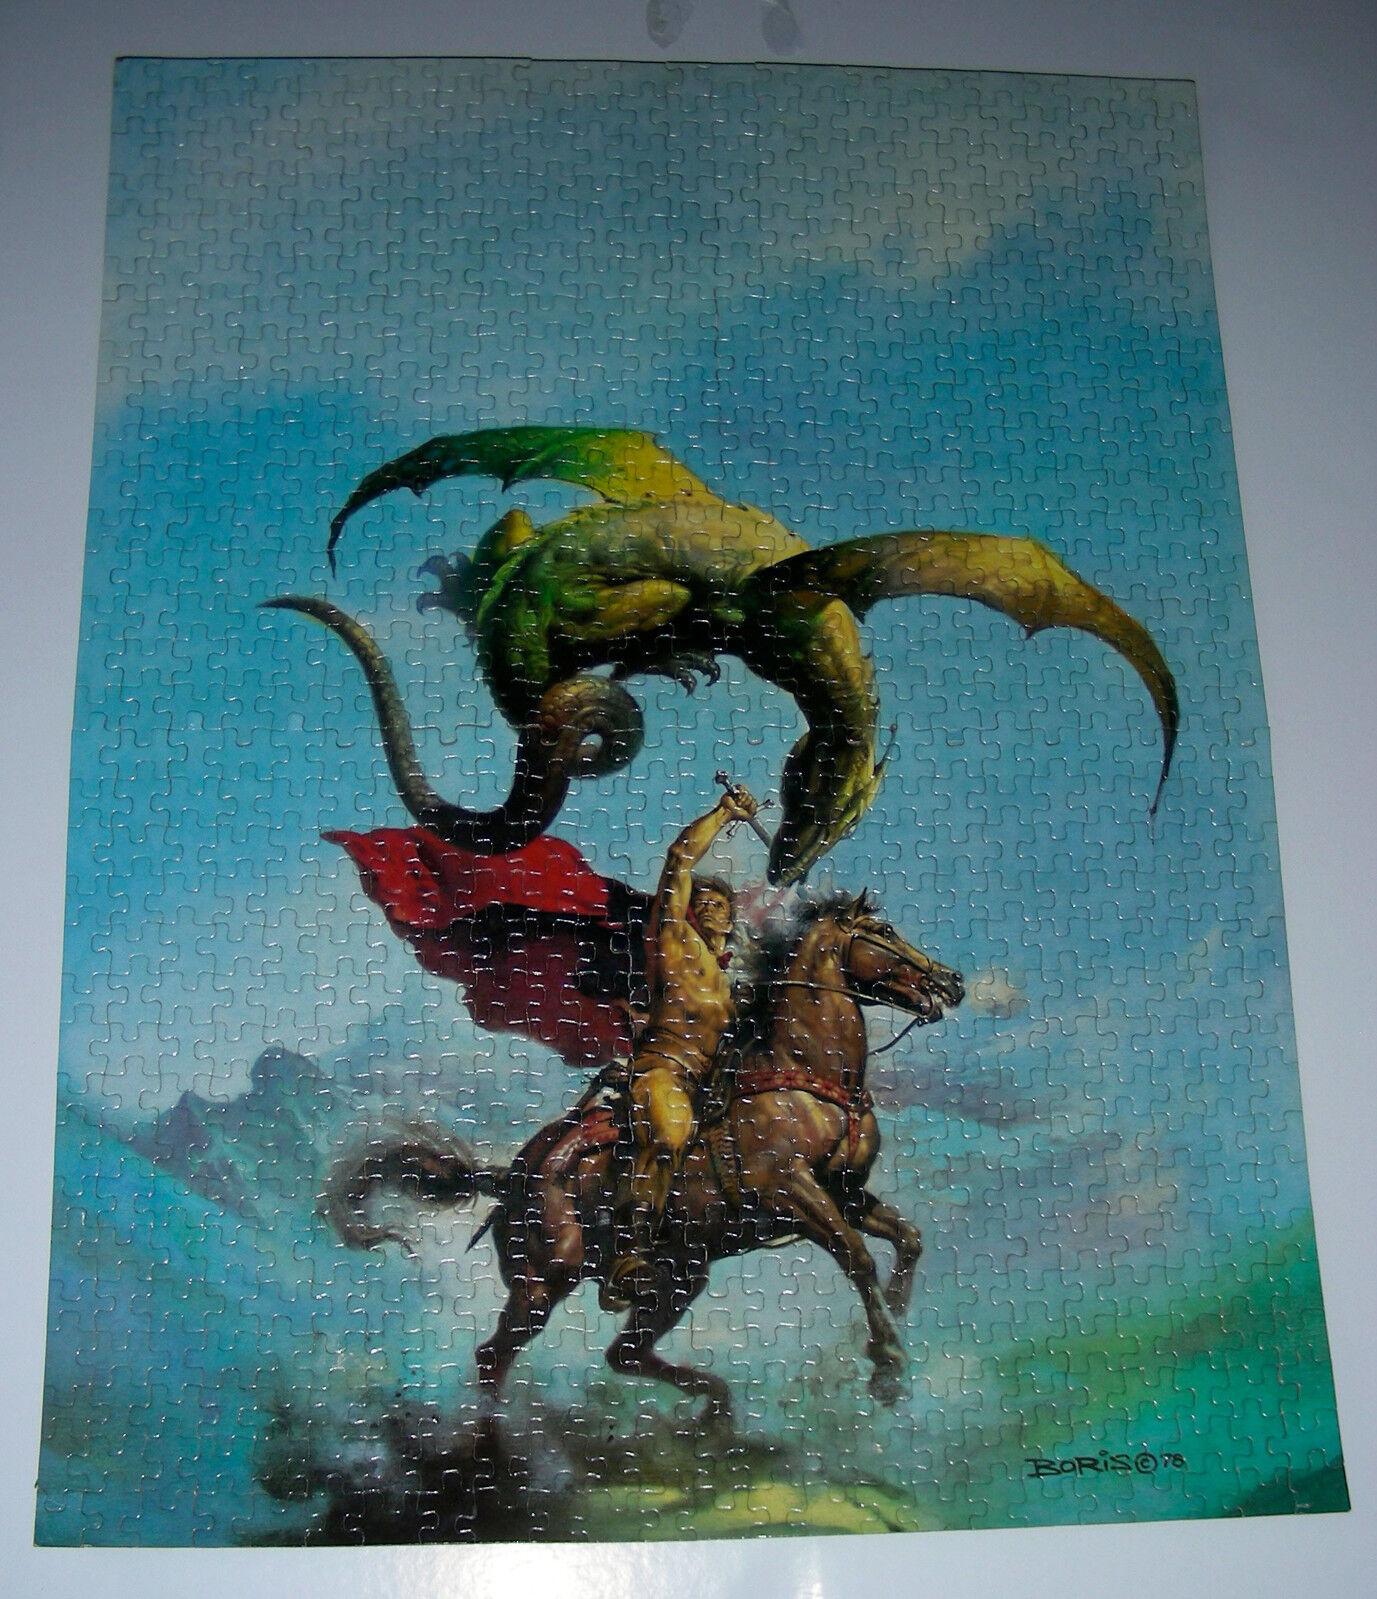 BORIS VALLEJO Fantasie puzzle 1981 Waddington 750 FliegenING SERPENT Complete rare